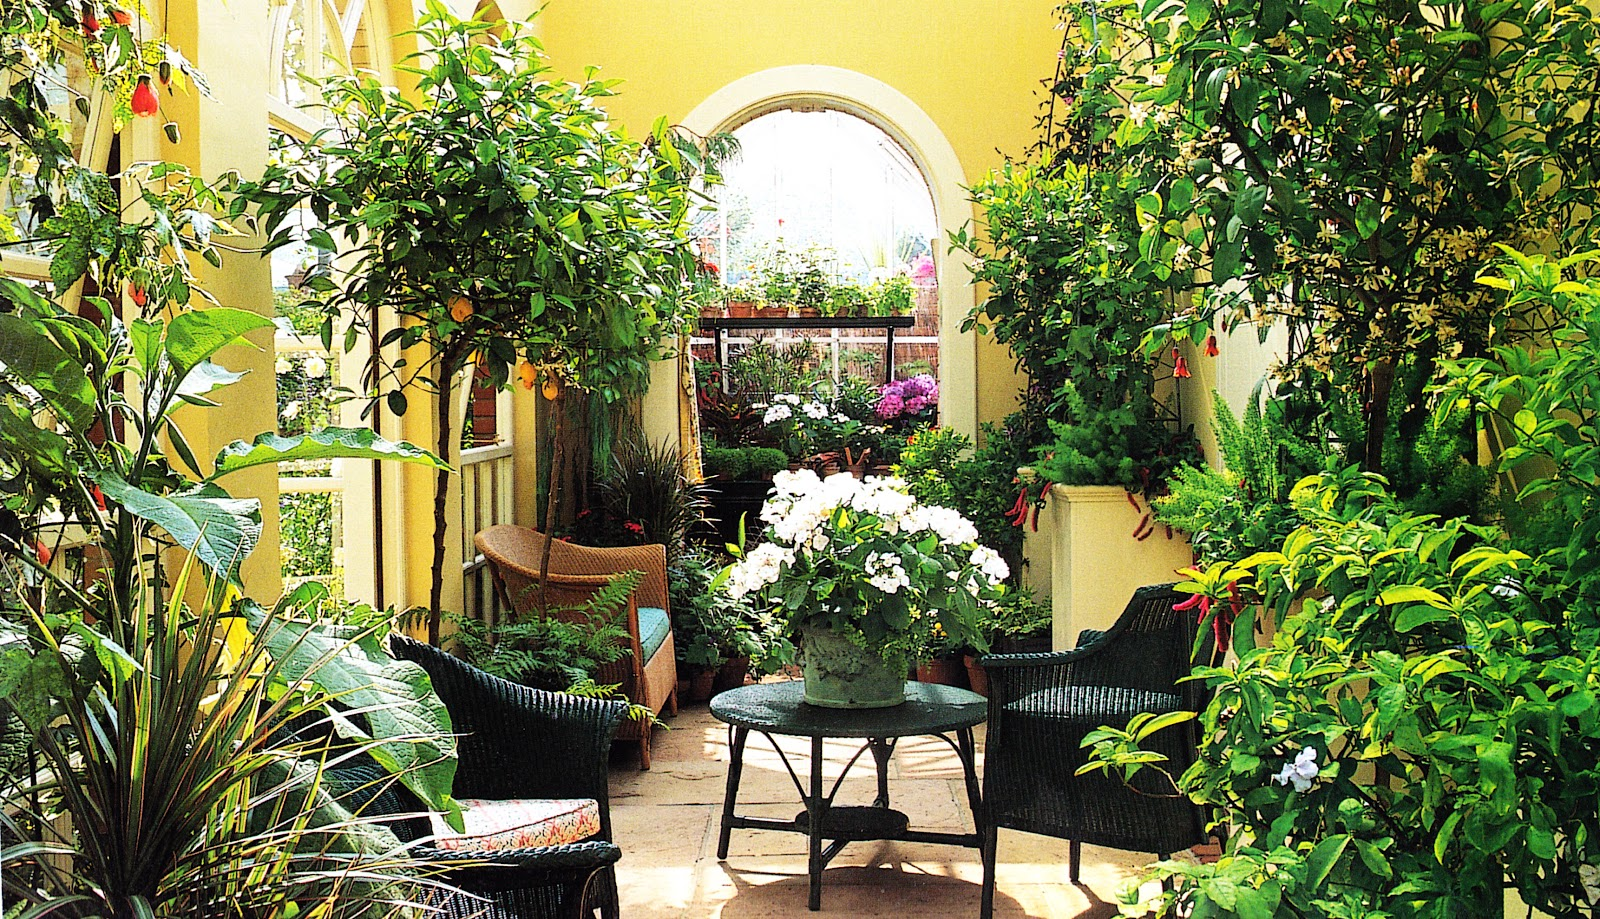 Сад желаний 2000 2 фотография